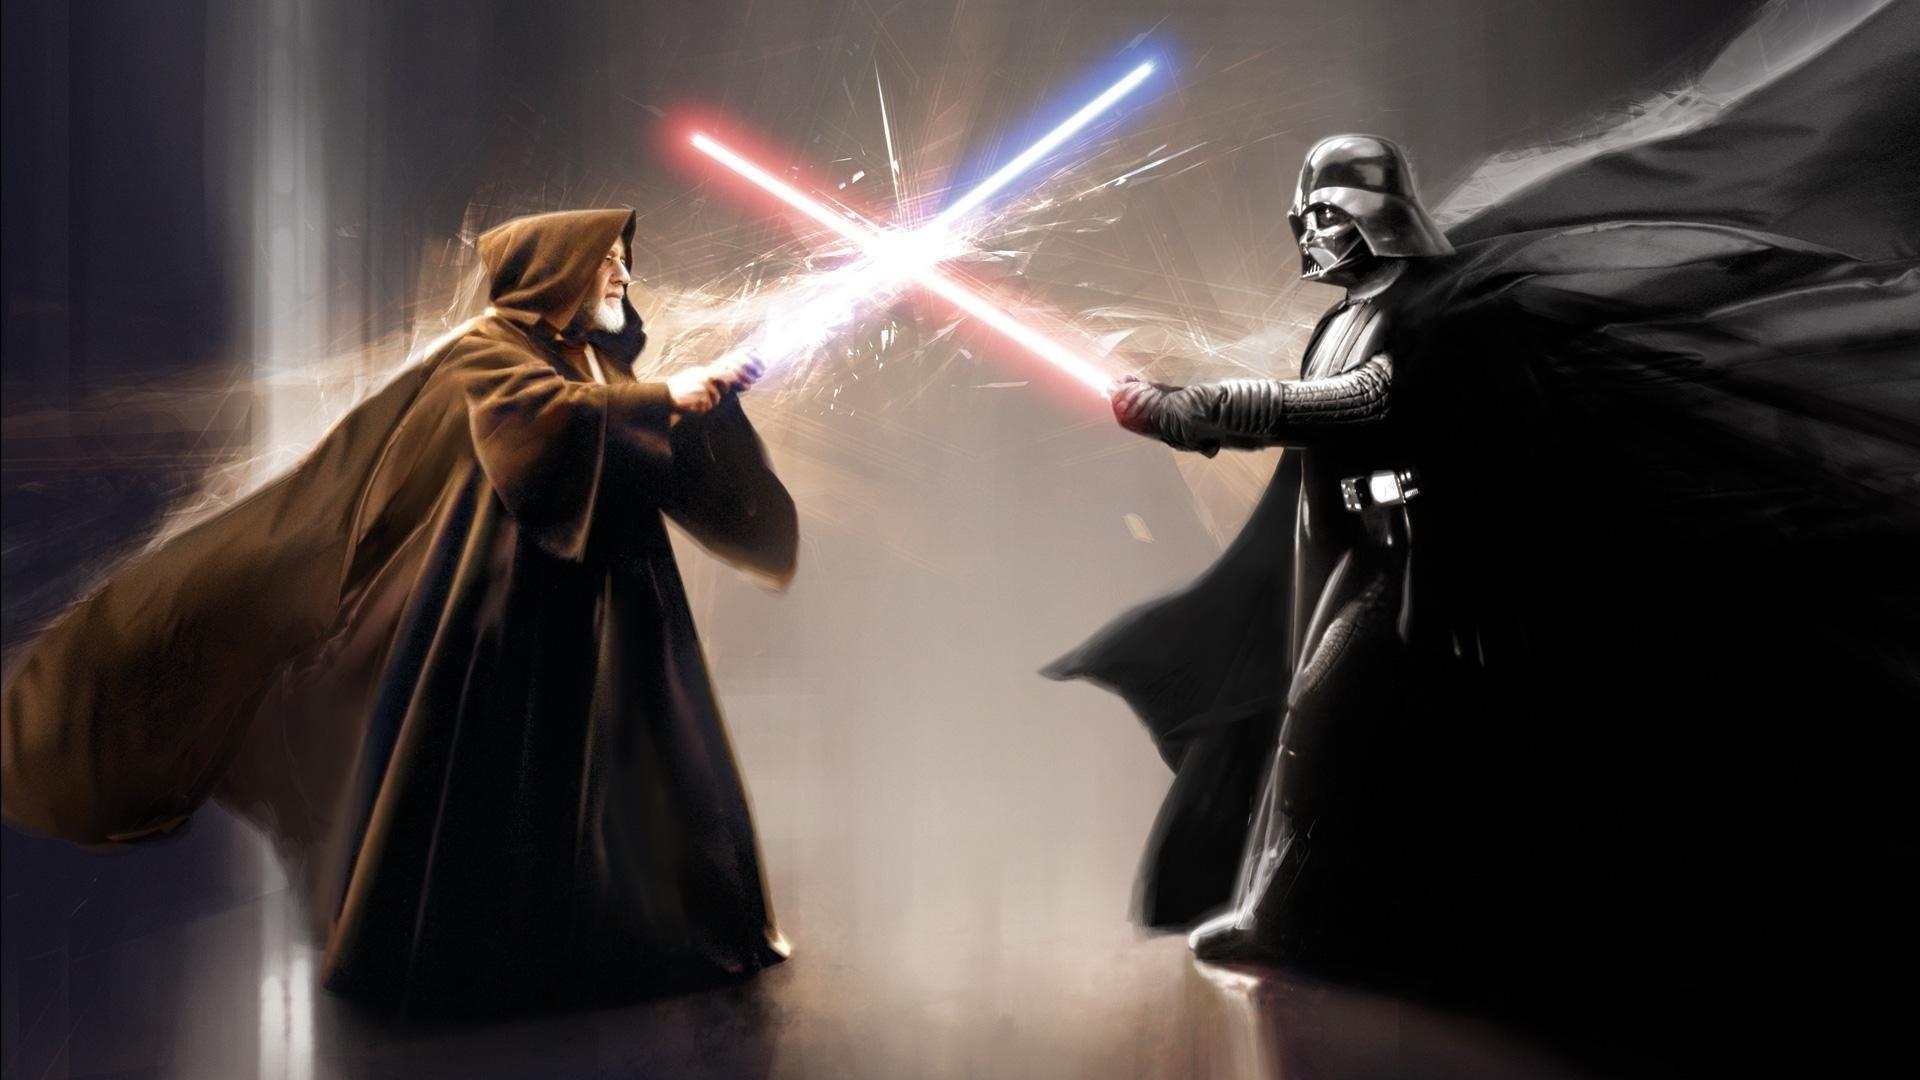 Wallpaper Star Wars Artwork Lightsaber Darth Vader Obi Wan Kenobi Darkness 1920x1080 Px Computer Wallpaper Special Effects 1920x1080 Wallup 786969 Hd Wallpapers Wallhere